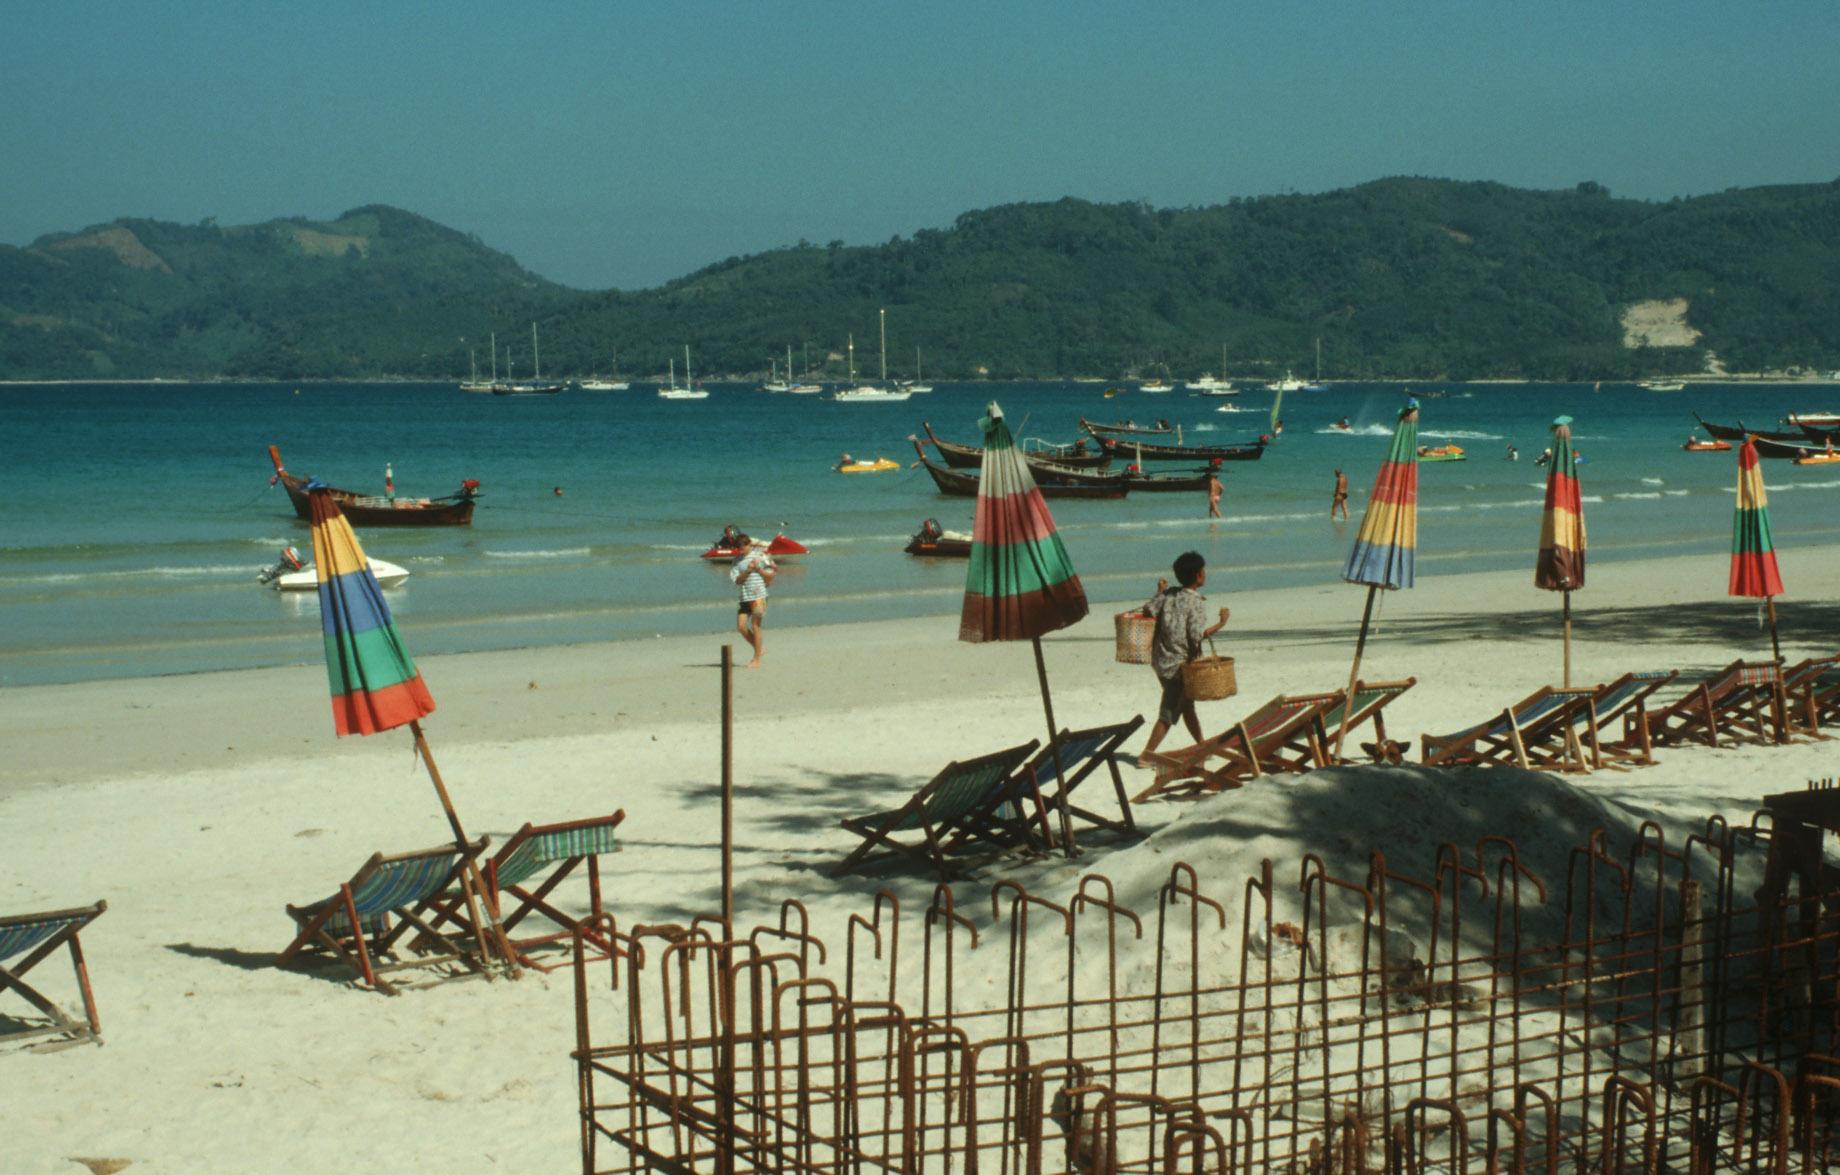 Thailand beach boats Kopie 2